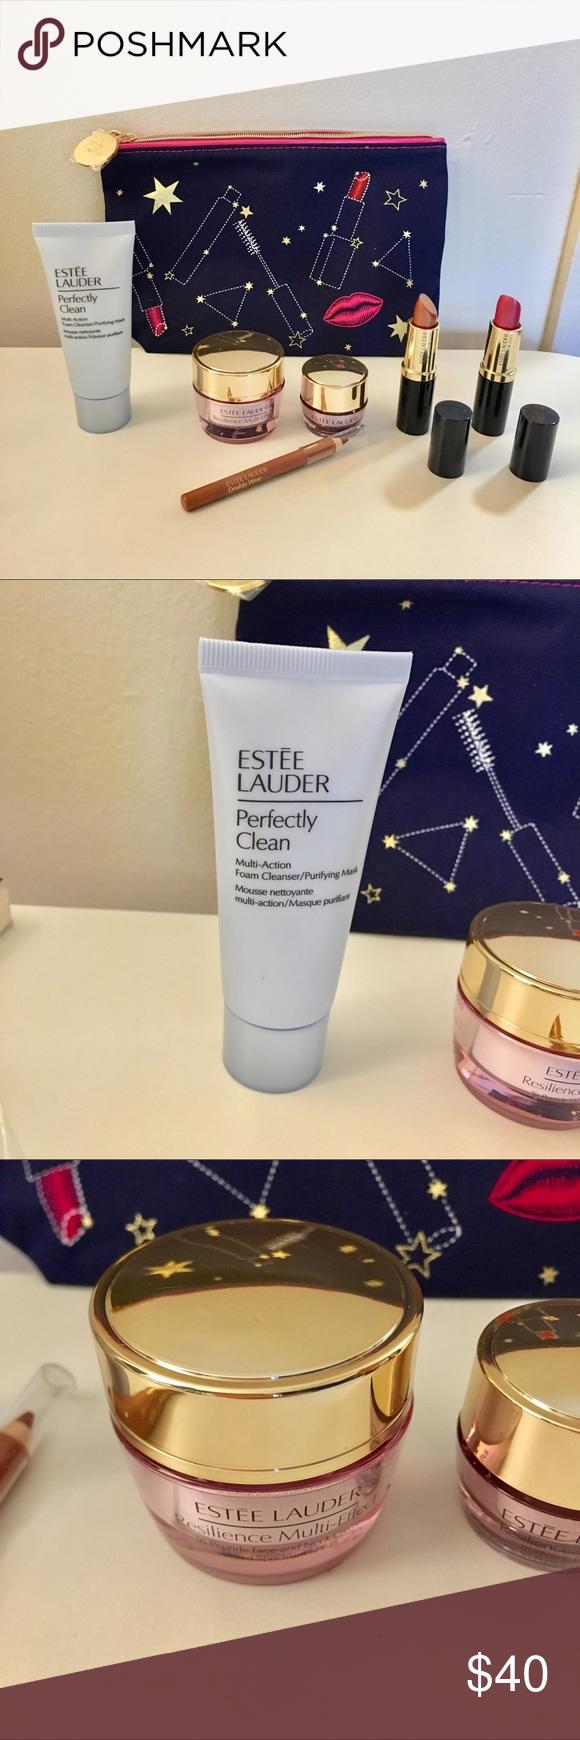 Estée Lauder Skincare and Makeup Travel Set NWT in 2020